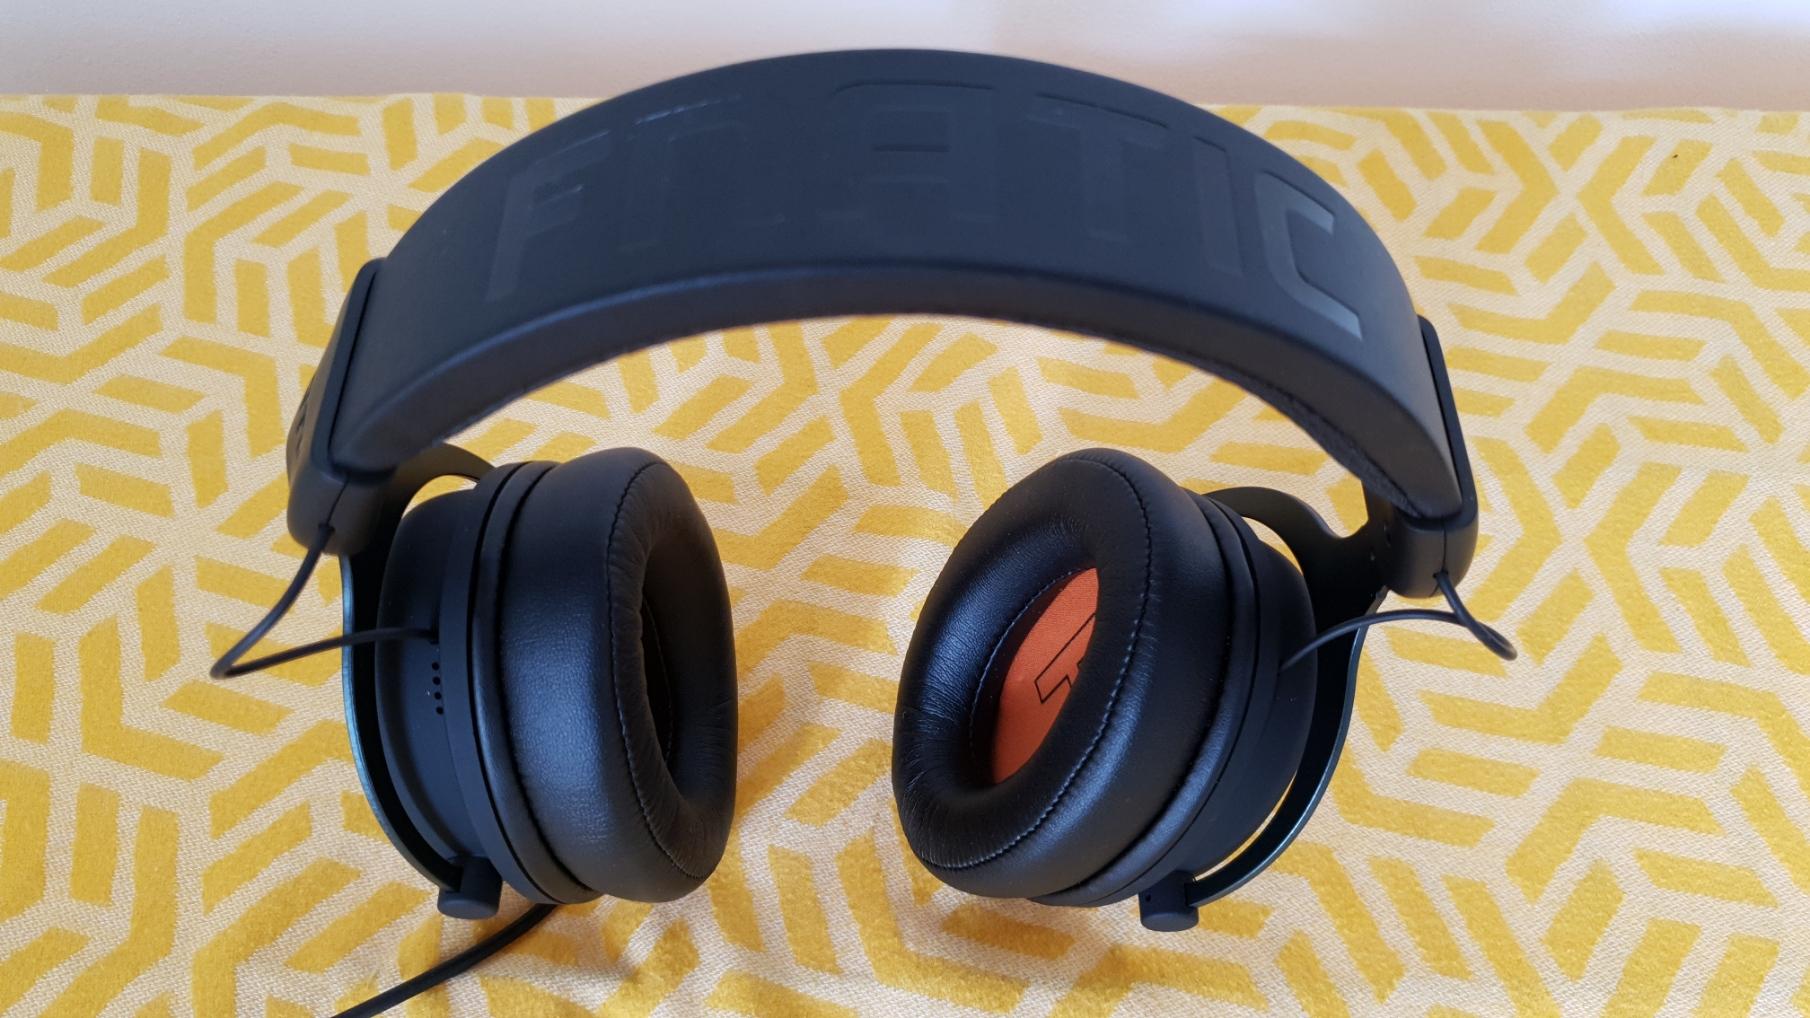 Fnatic React Plus gaming headset